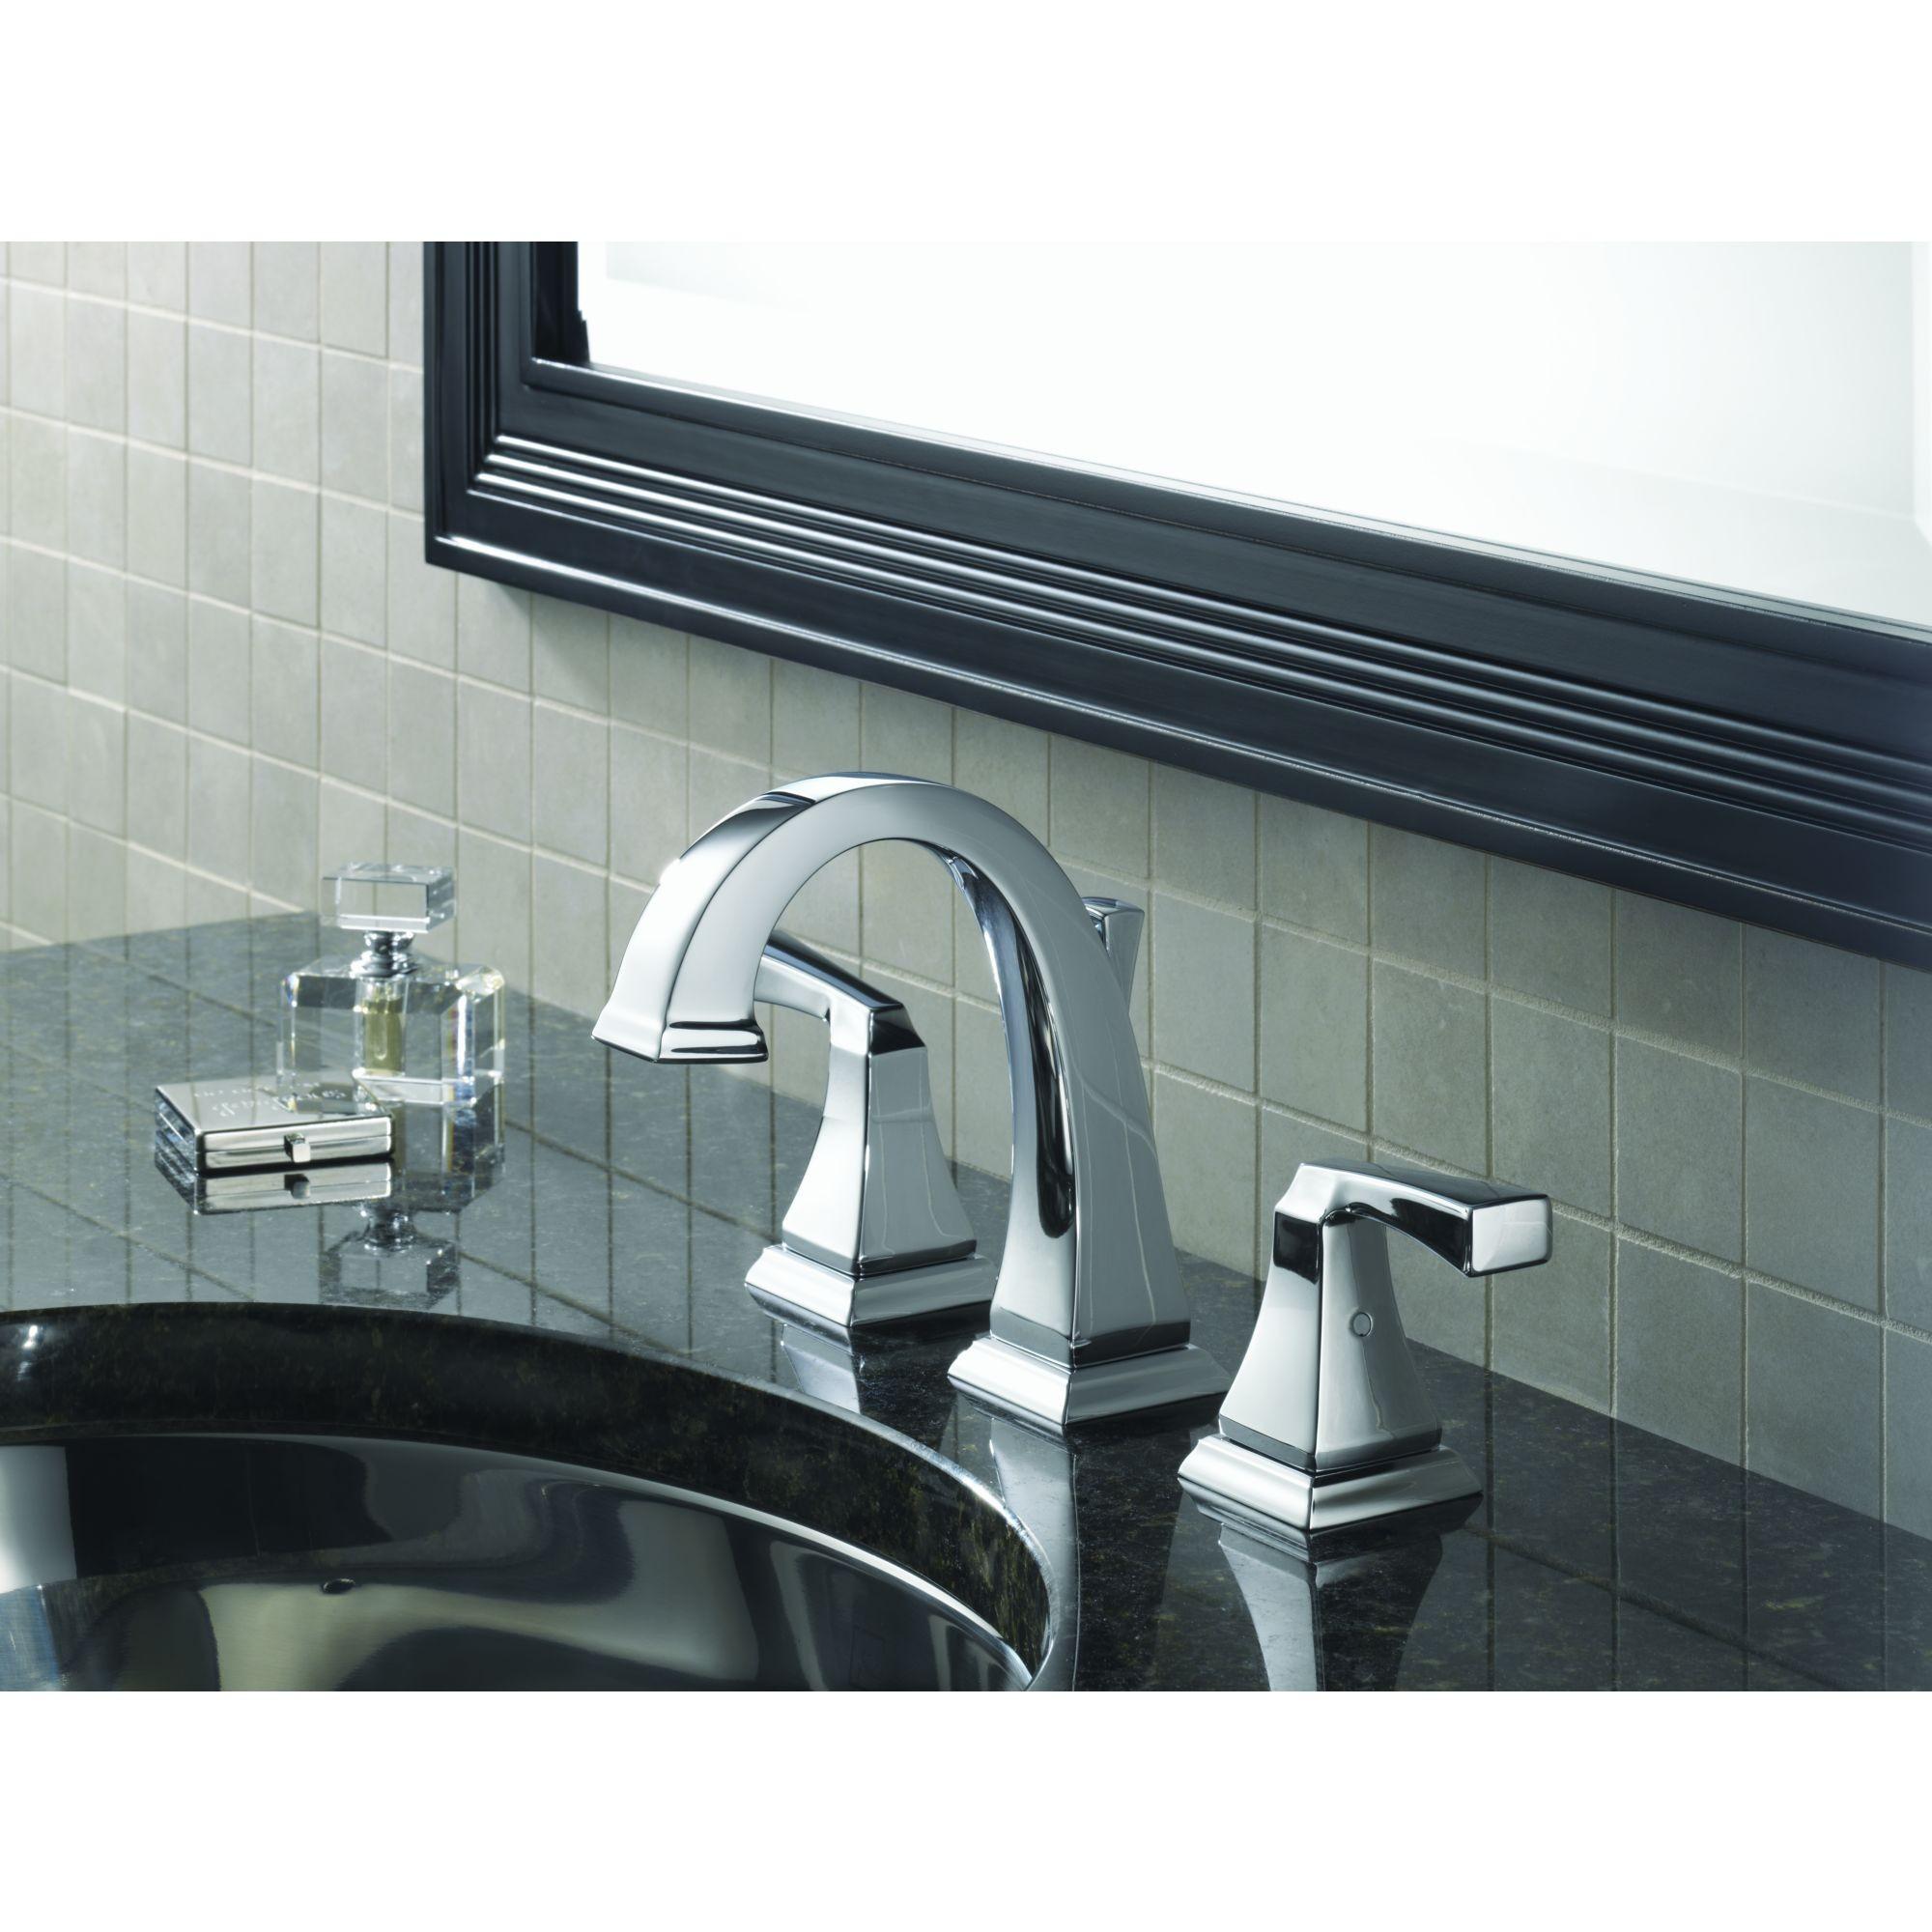 Lavatory Faucet Installs